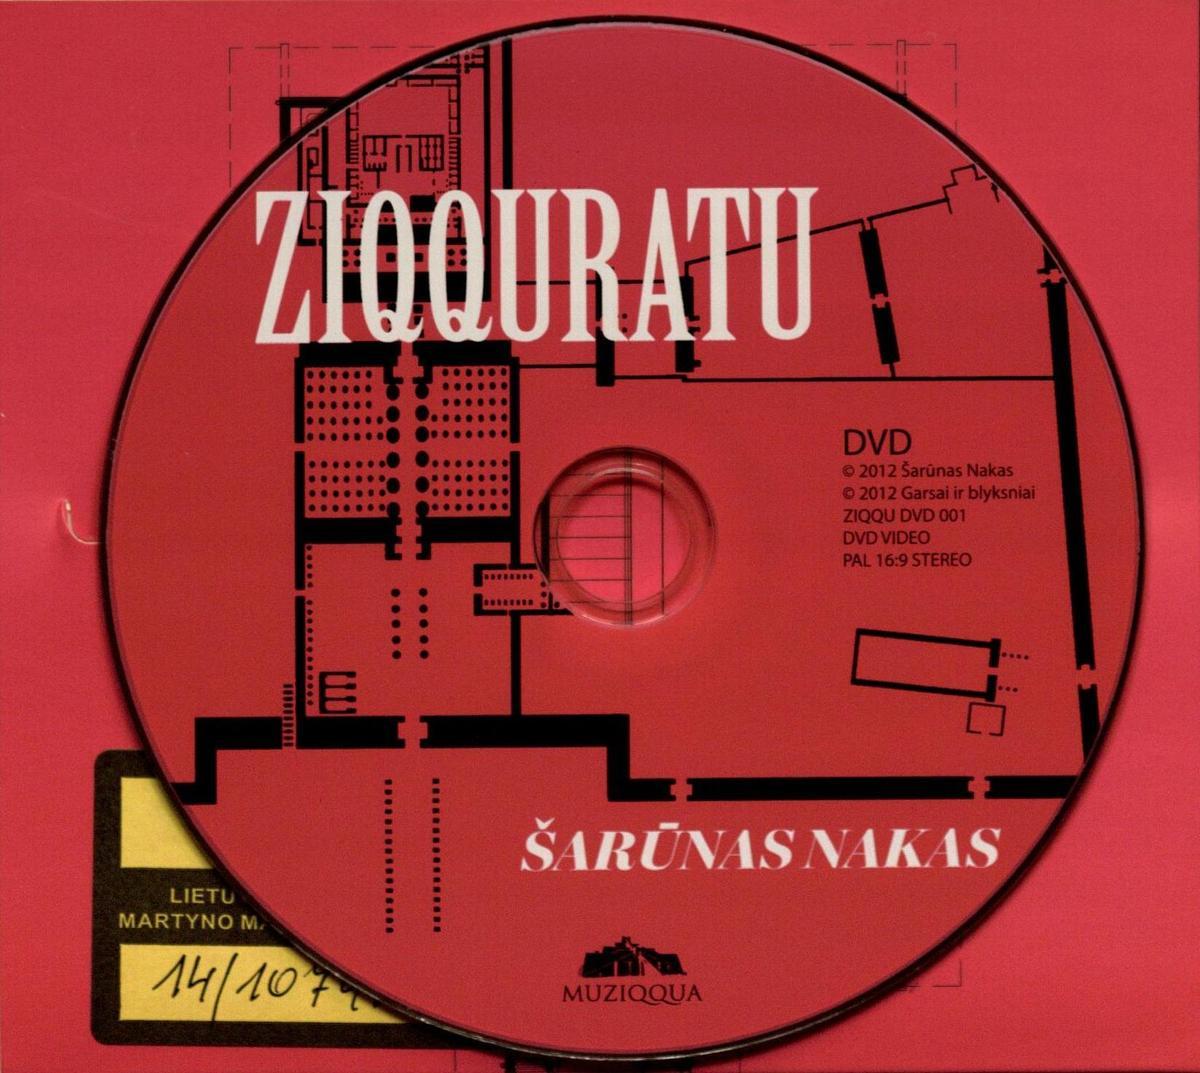 Ziqquratu [Komplektas] : elektroninė muzika ir multimedijos darbai